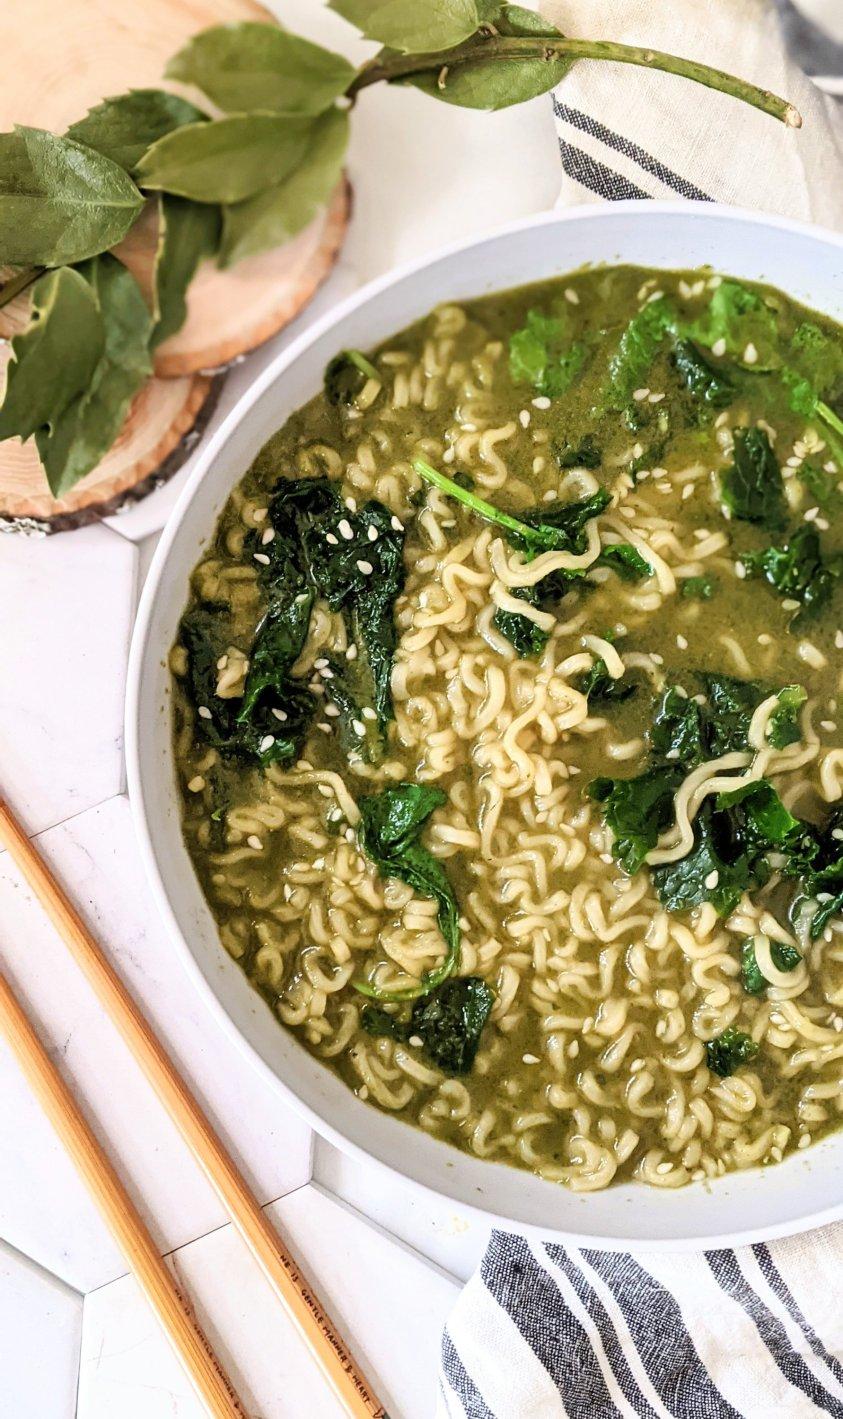 thai basil ramen noodles vegan gluten free instant ramen soup hacks with fresh vegetables add thai basil pesto ramen noodle soup vegetarian meatless pantry noodles recipe